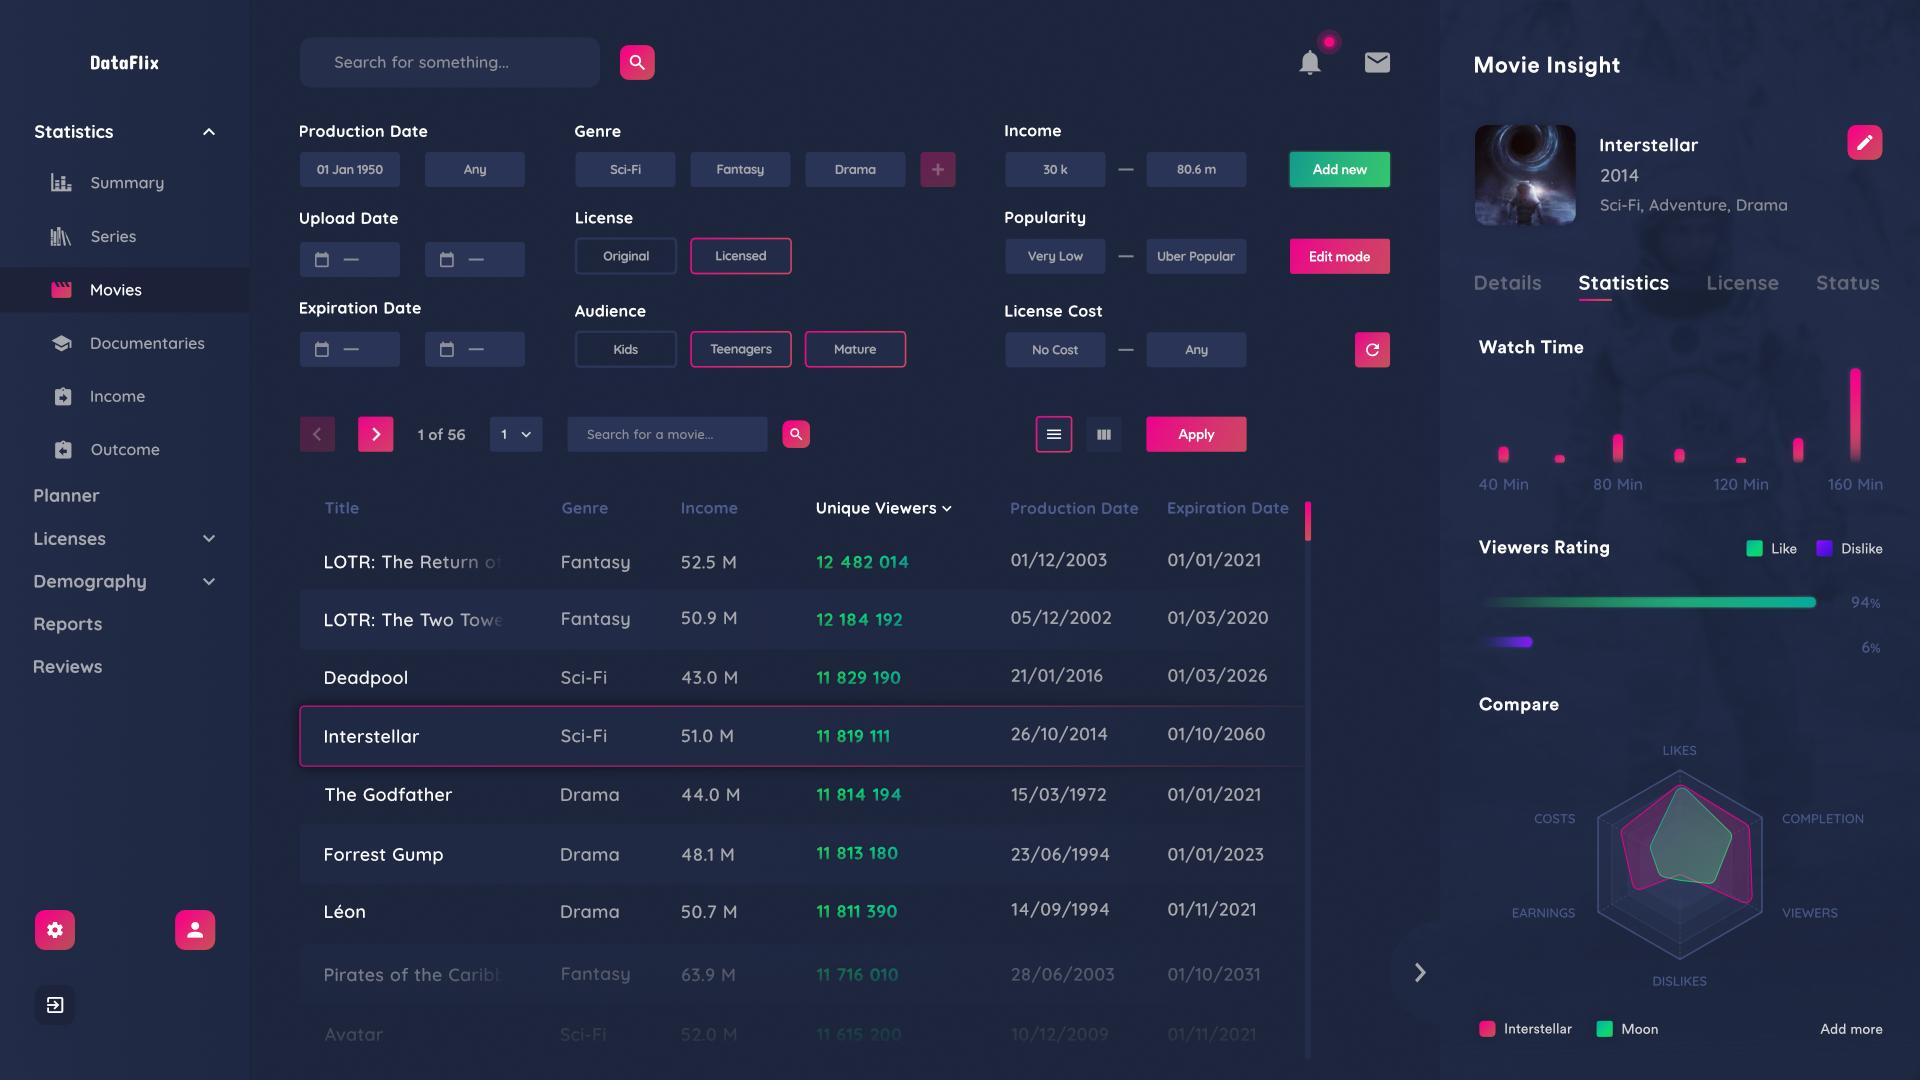 Dataflix dashboard 2